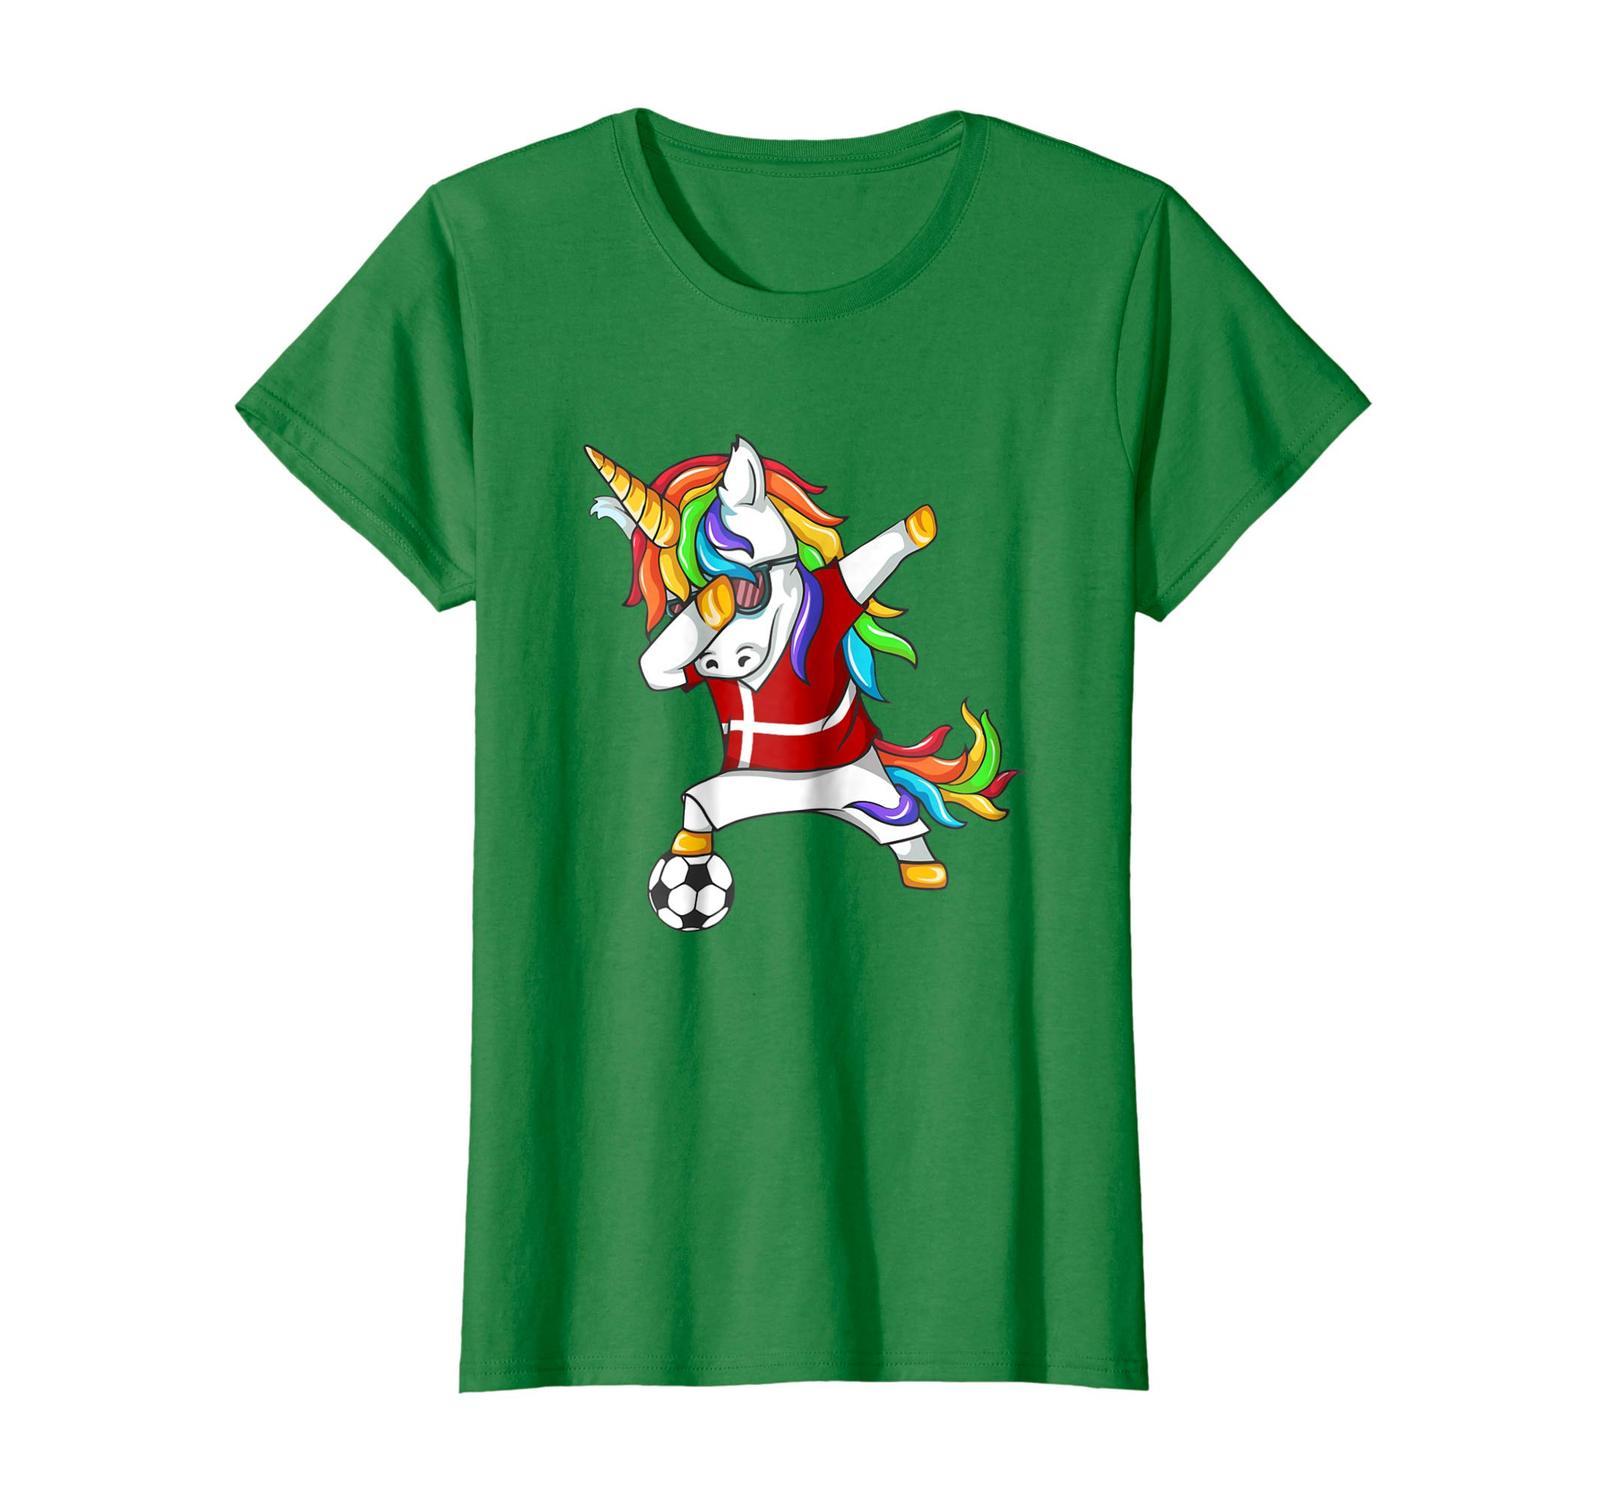 New Shirts - Dabbing Soccer 2018 Unicorn Denmark T-Shirt Wowen